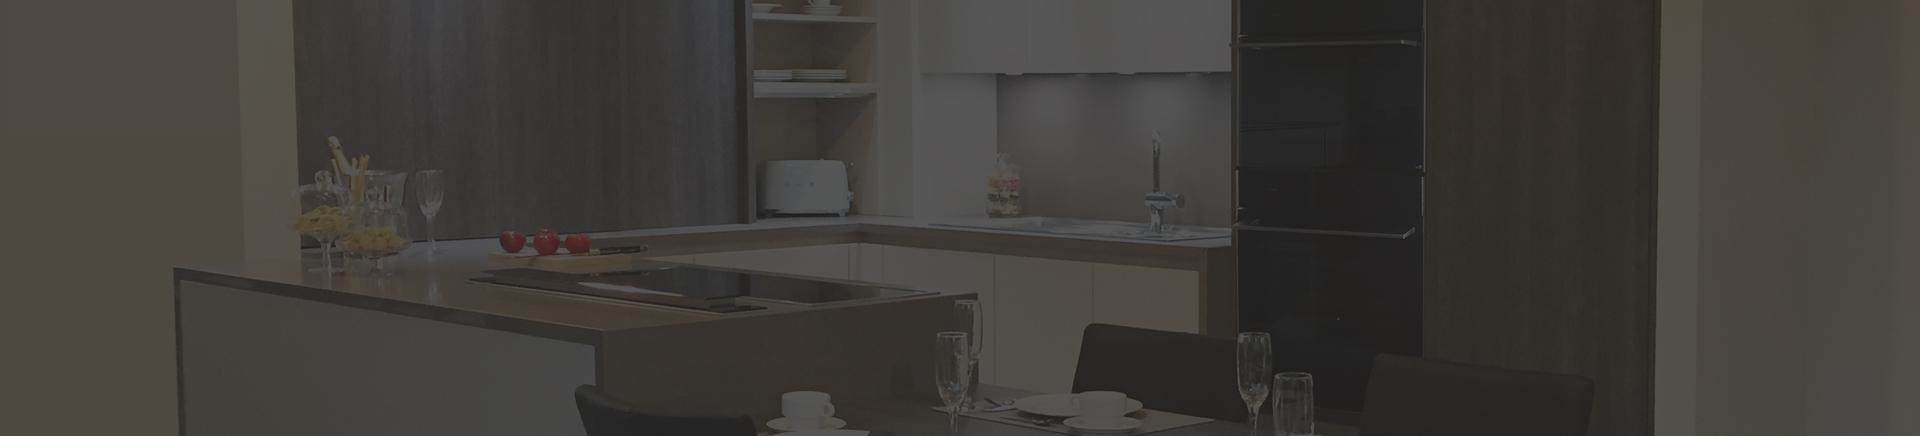 Keukencomfort   vdh keukens zottegem